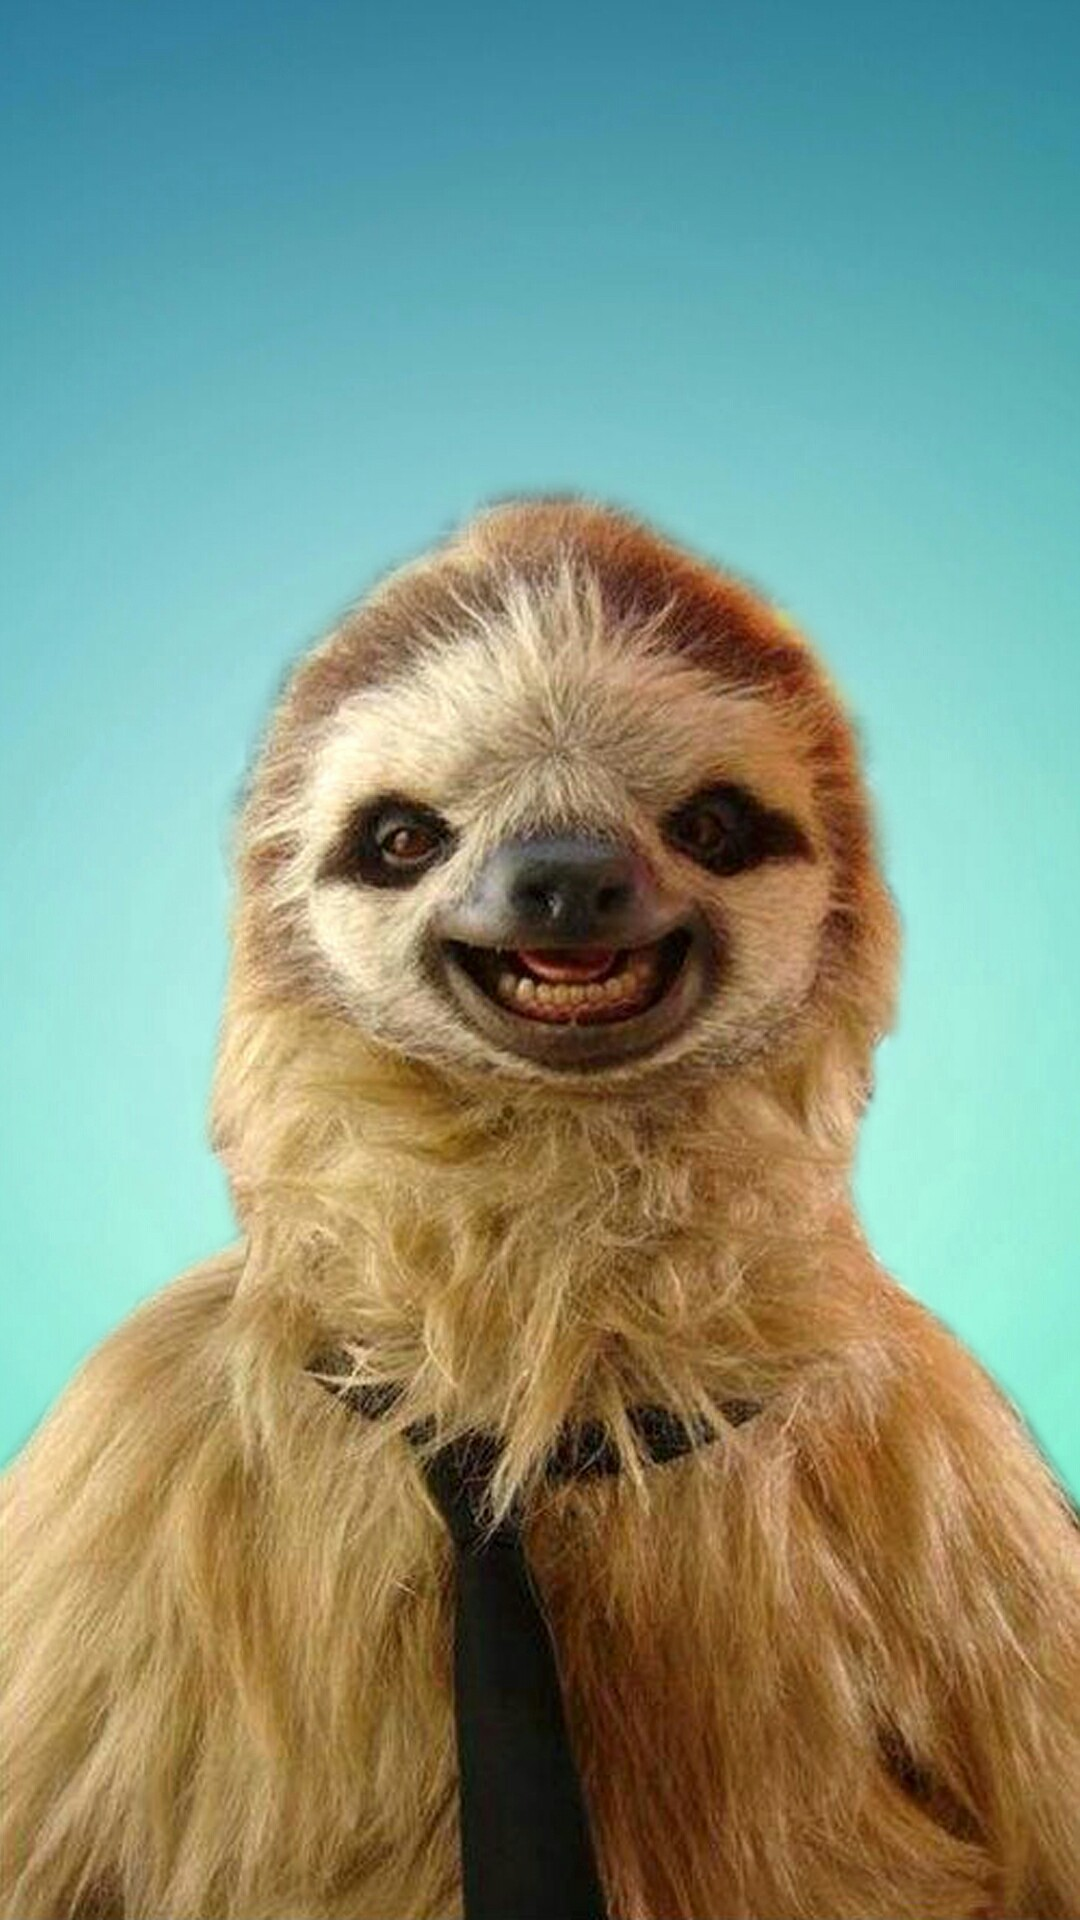 Sloth! A cute sloth phone wallpaper I made.